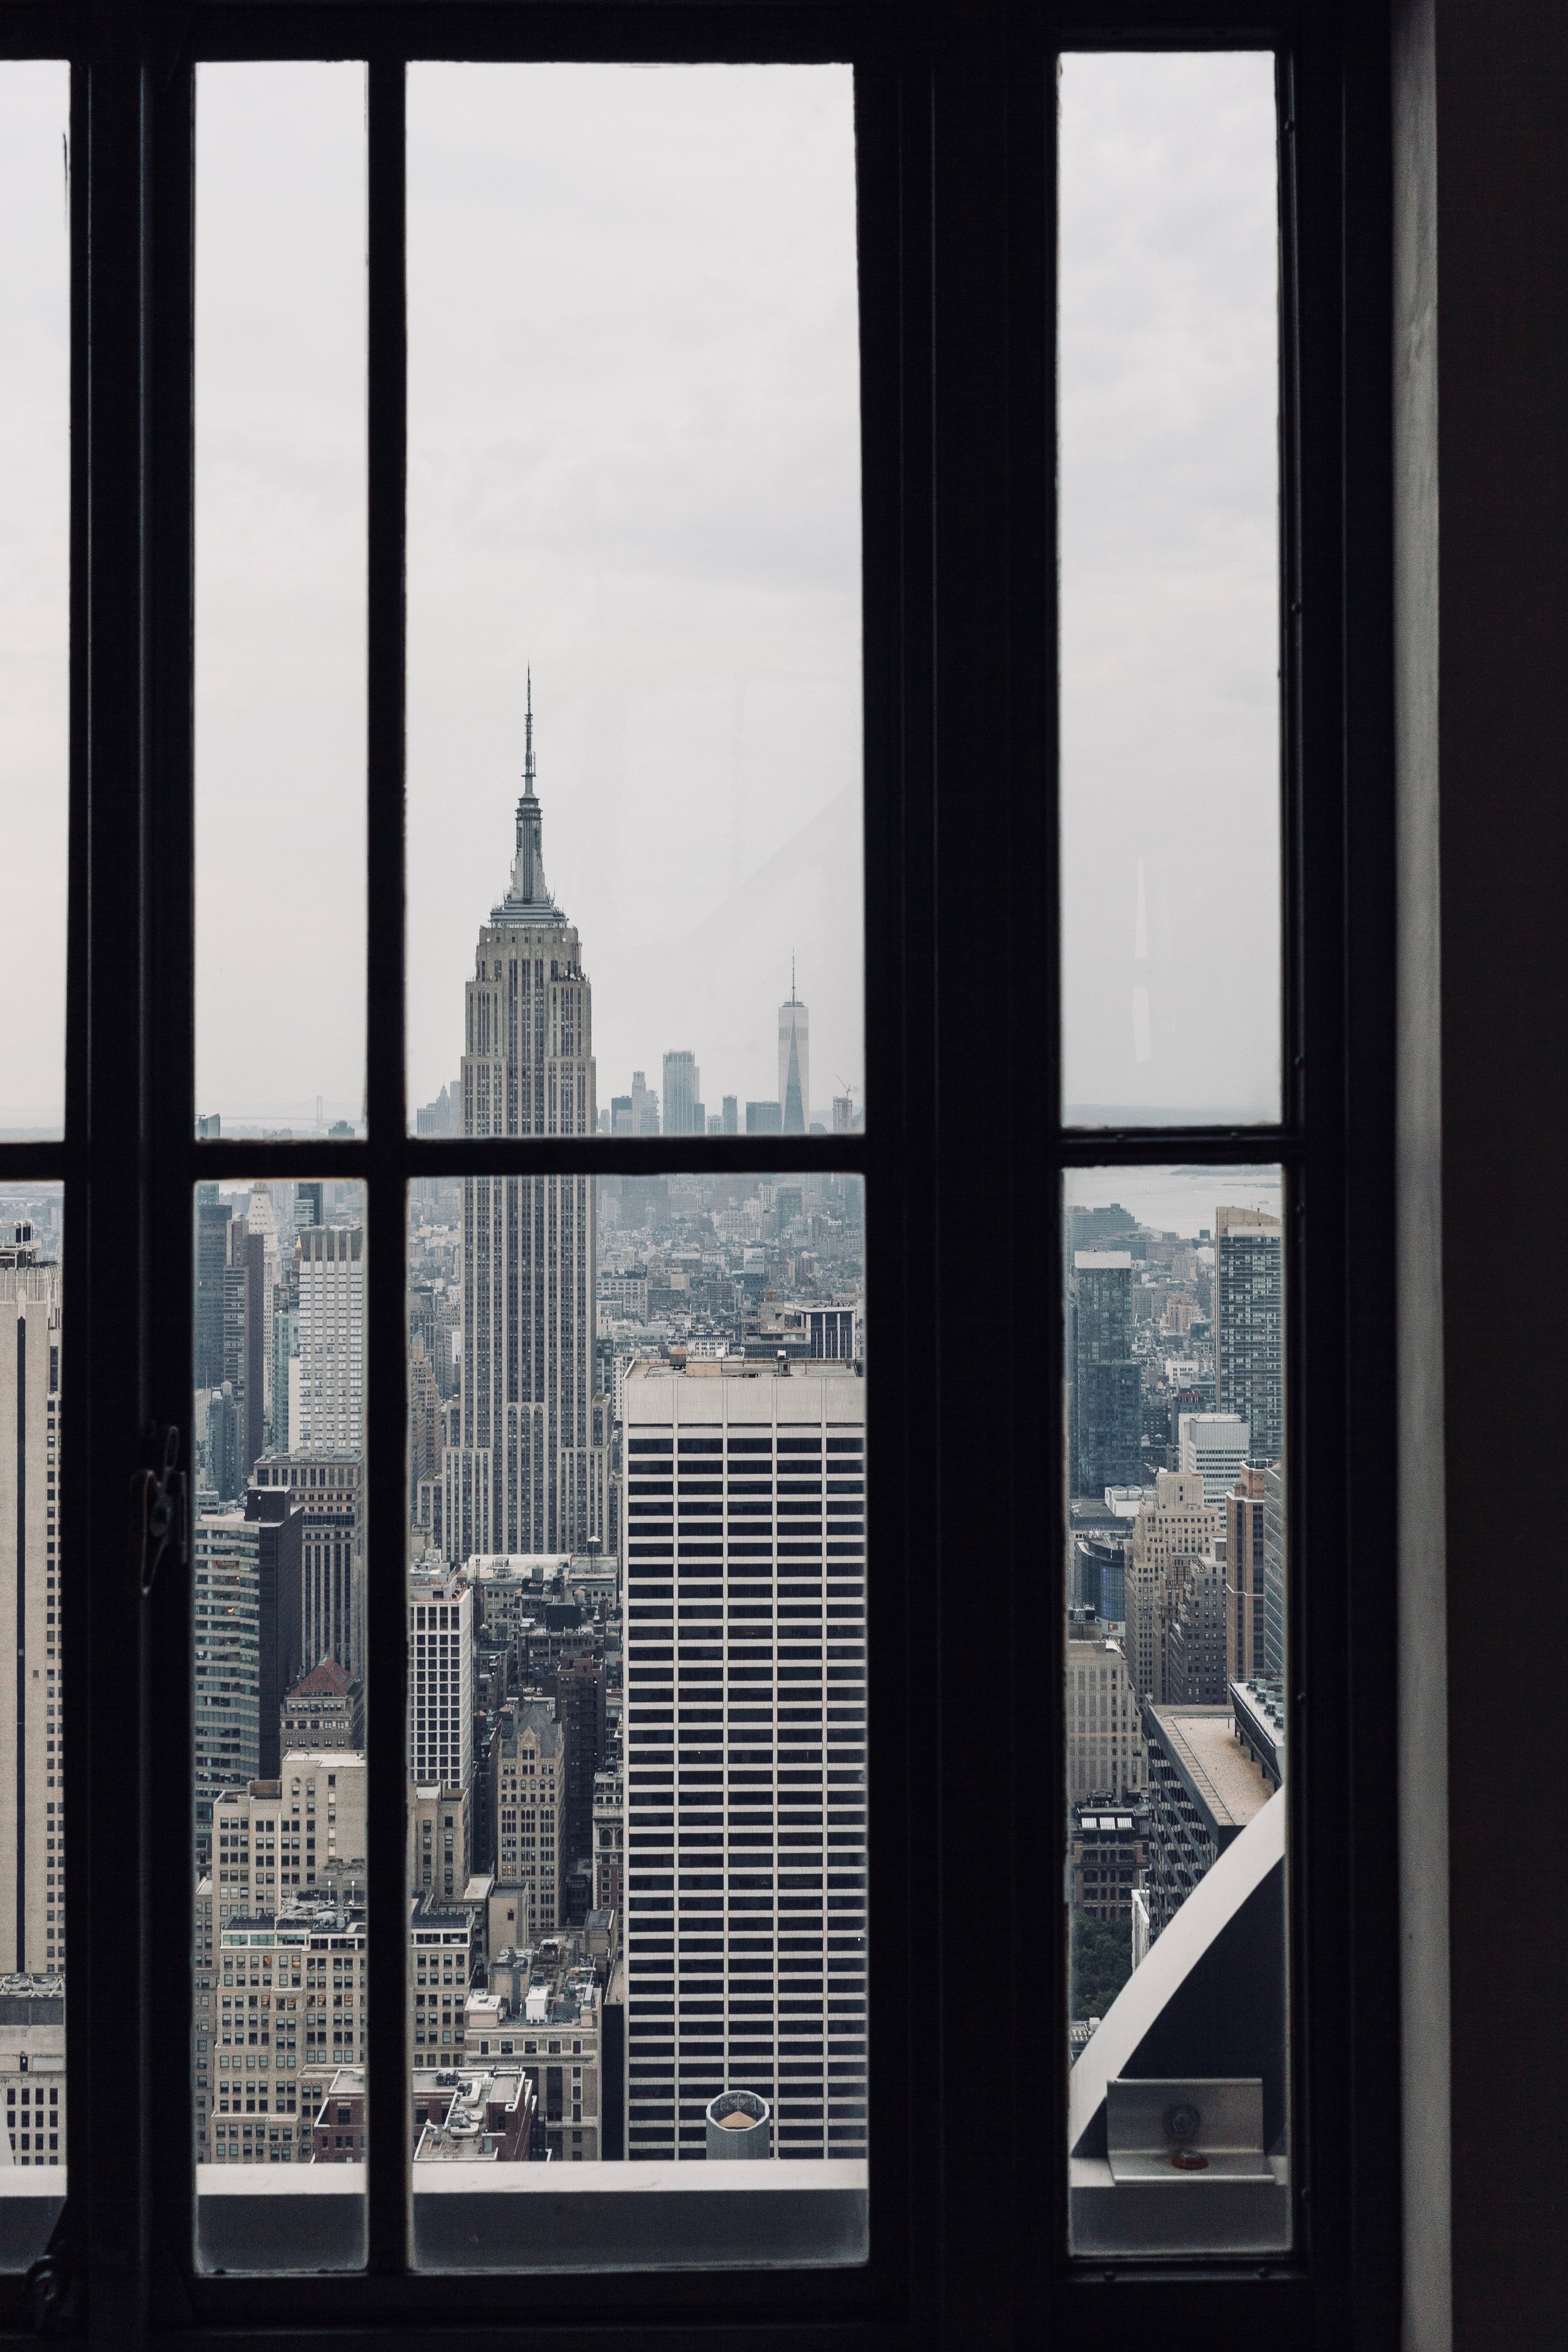 NYC-PY8.JPG